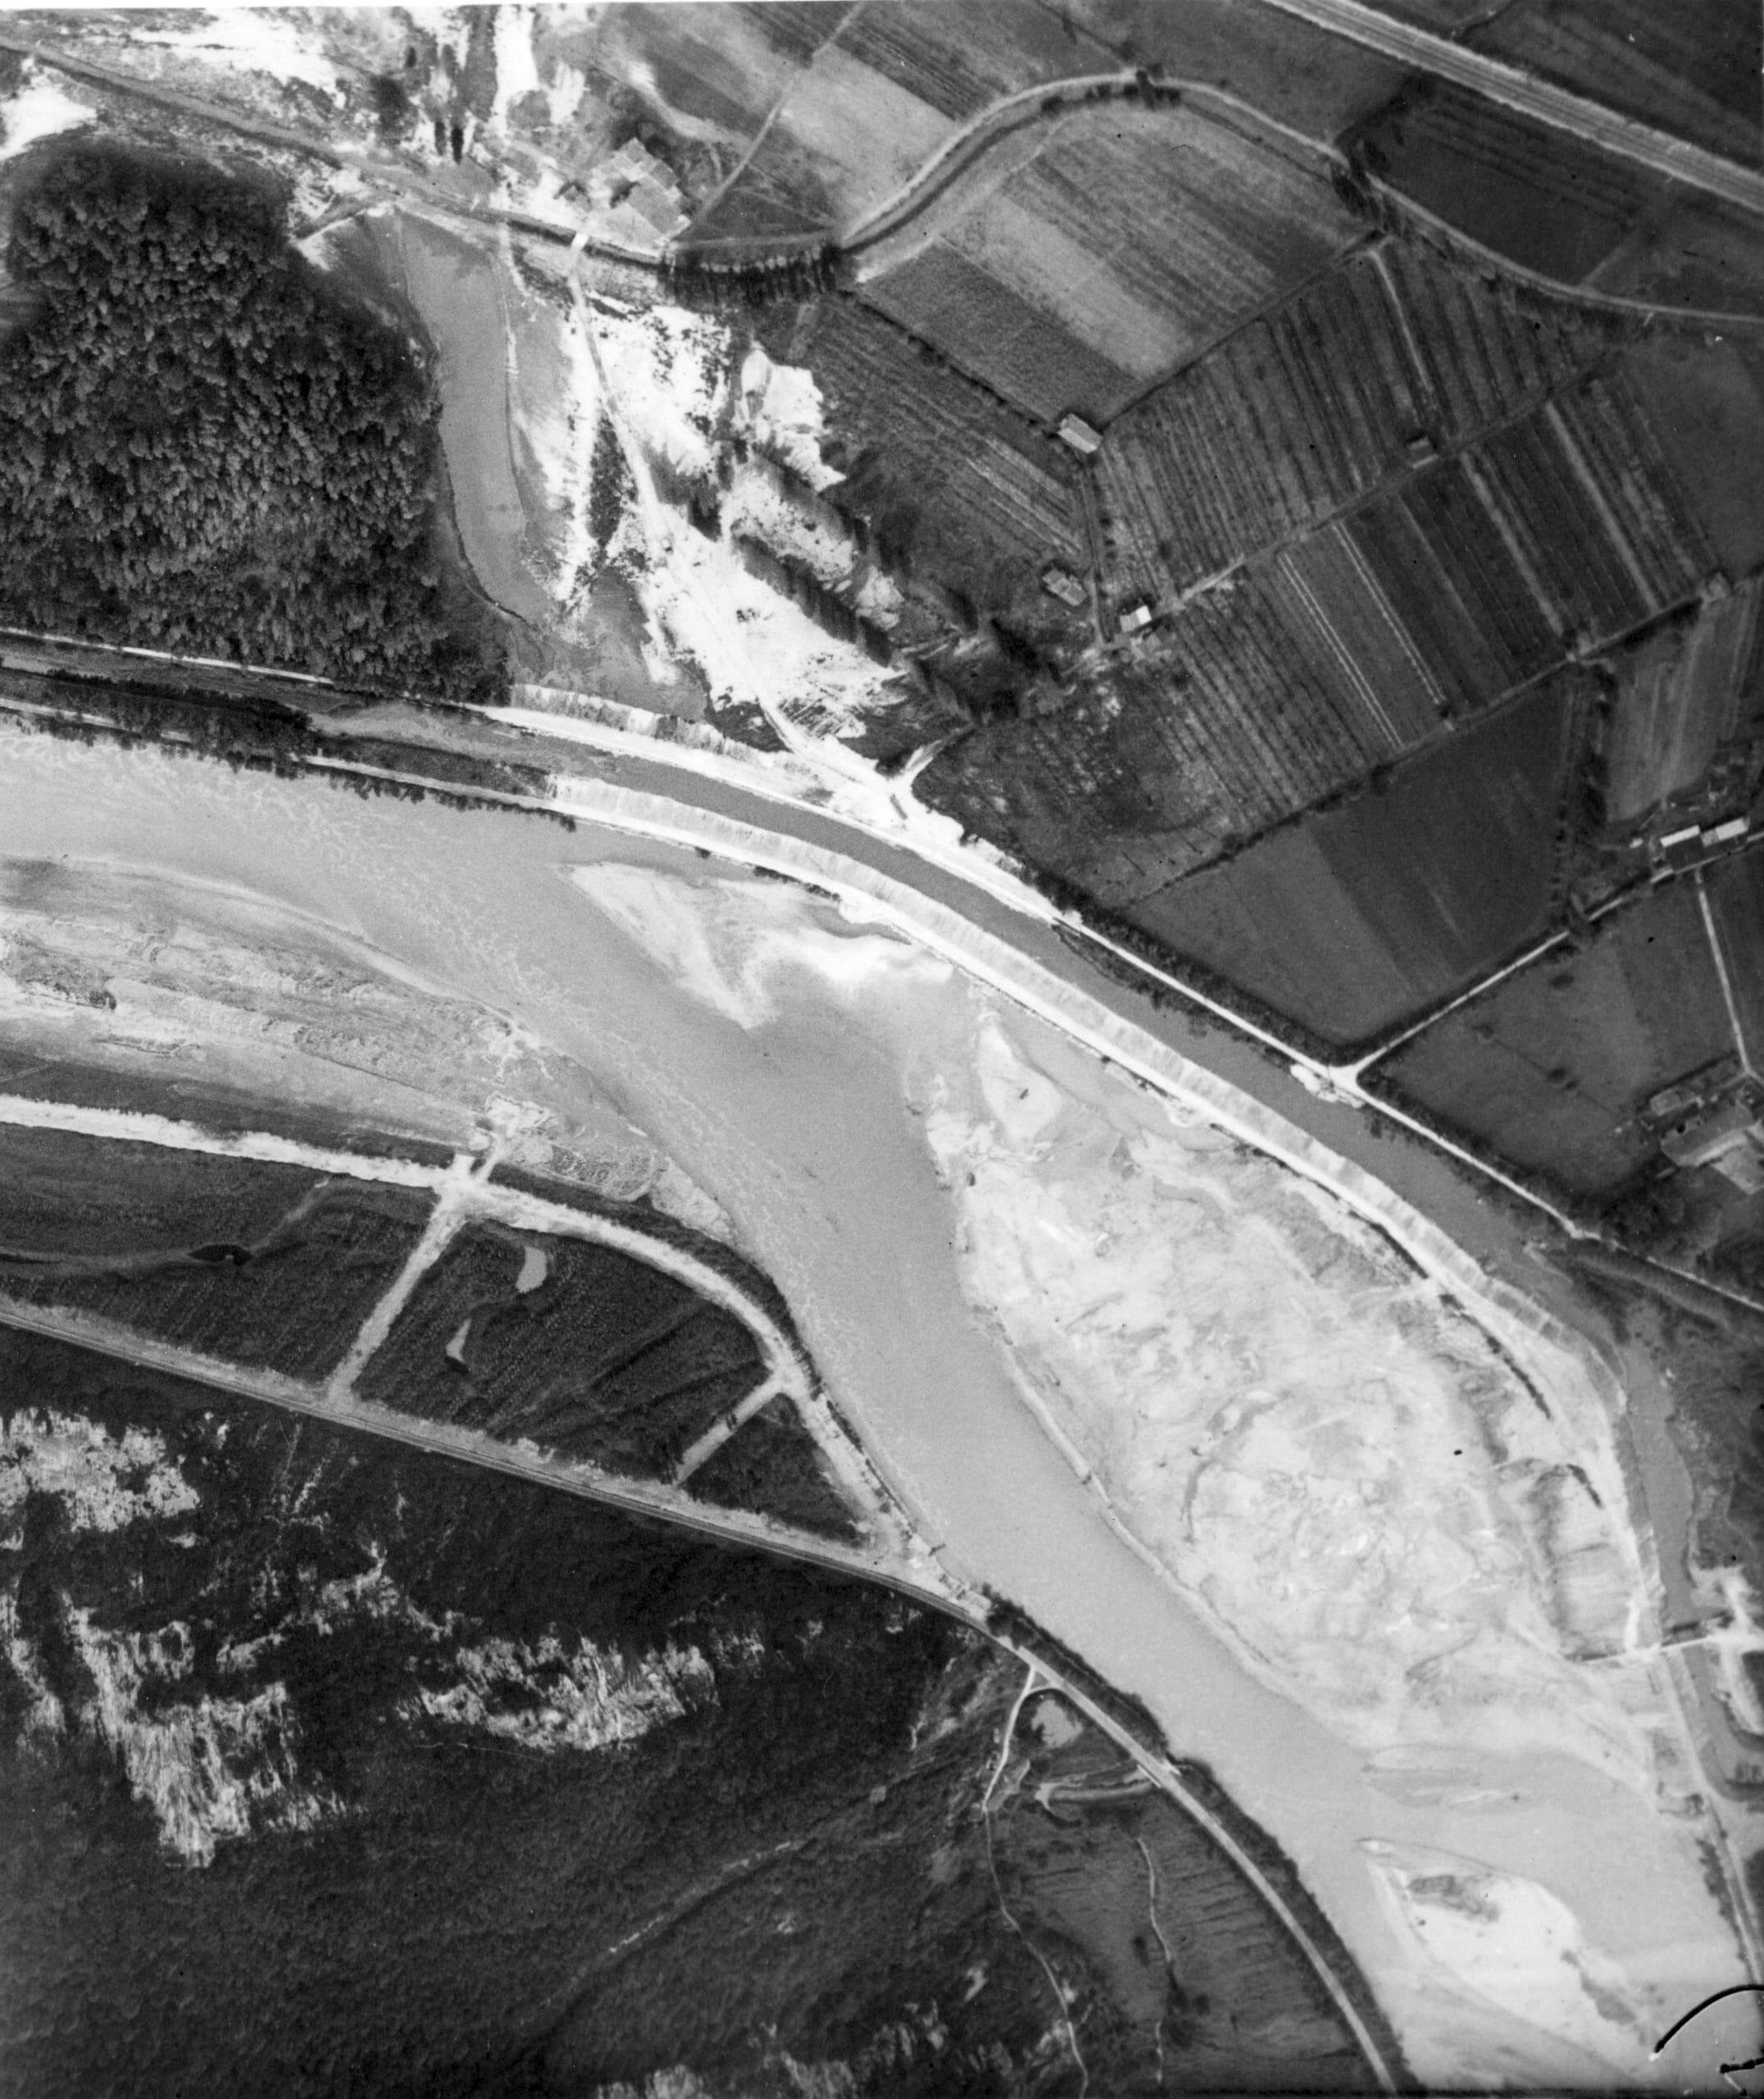 BRECHE PALLUEL APRES TRAVAUX 2 CRUE 1948